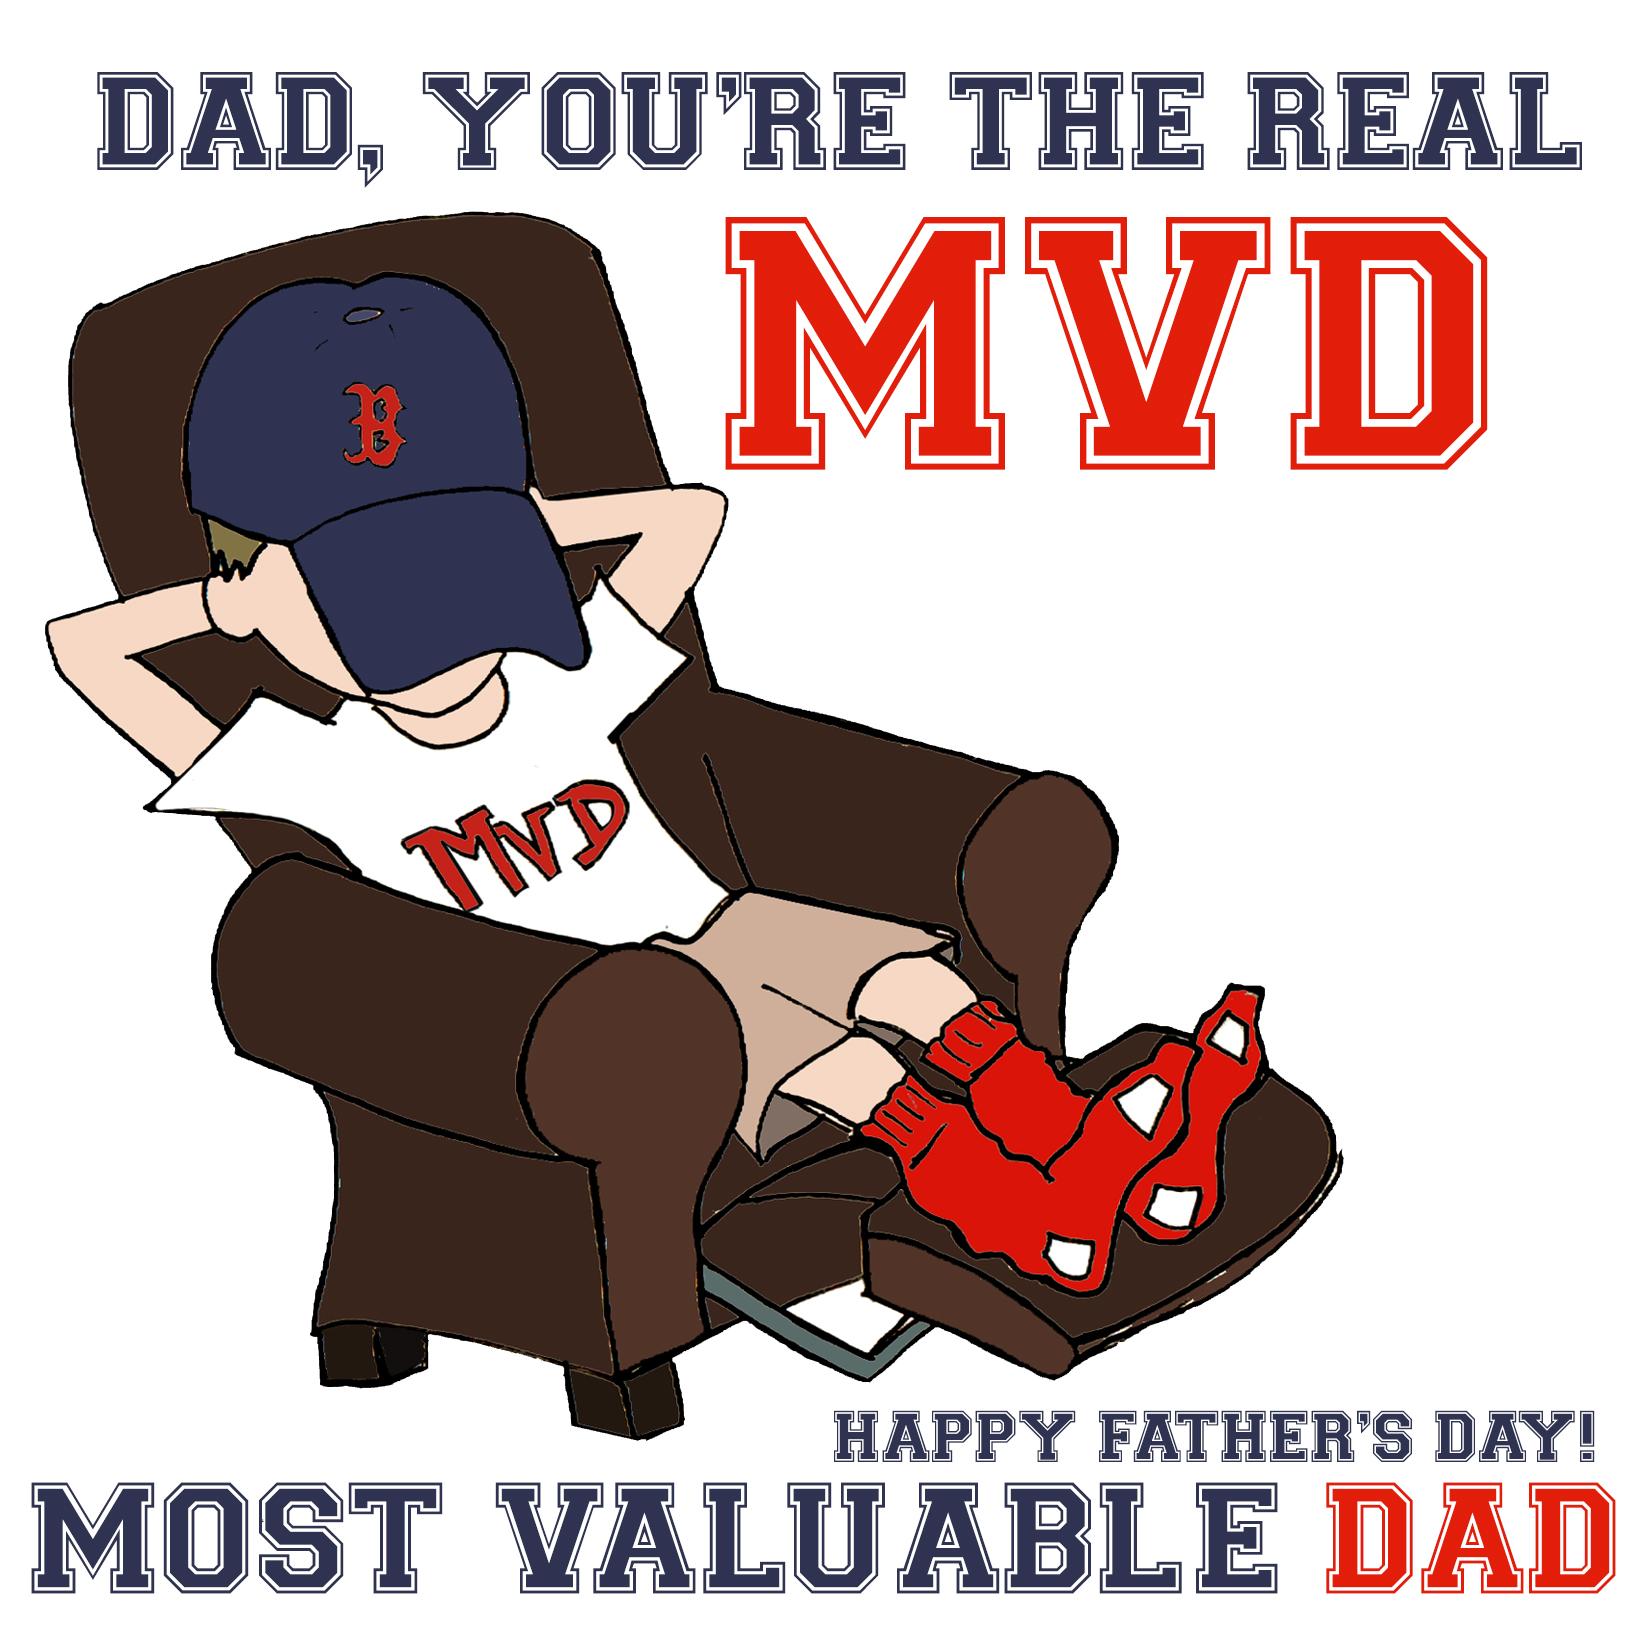 MVD_Most Valuable Dad